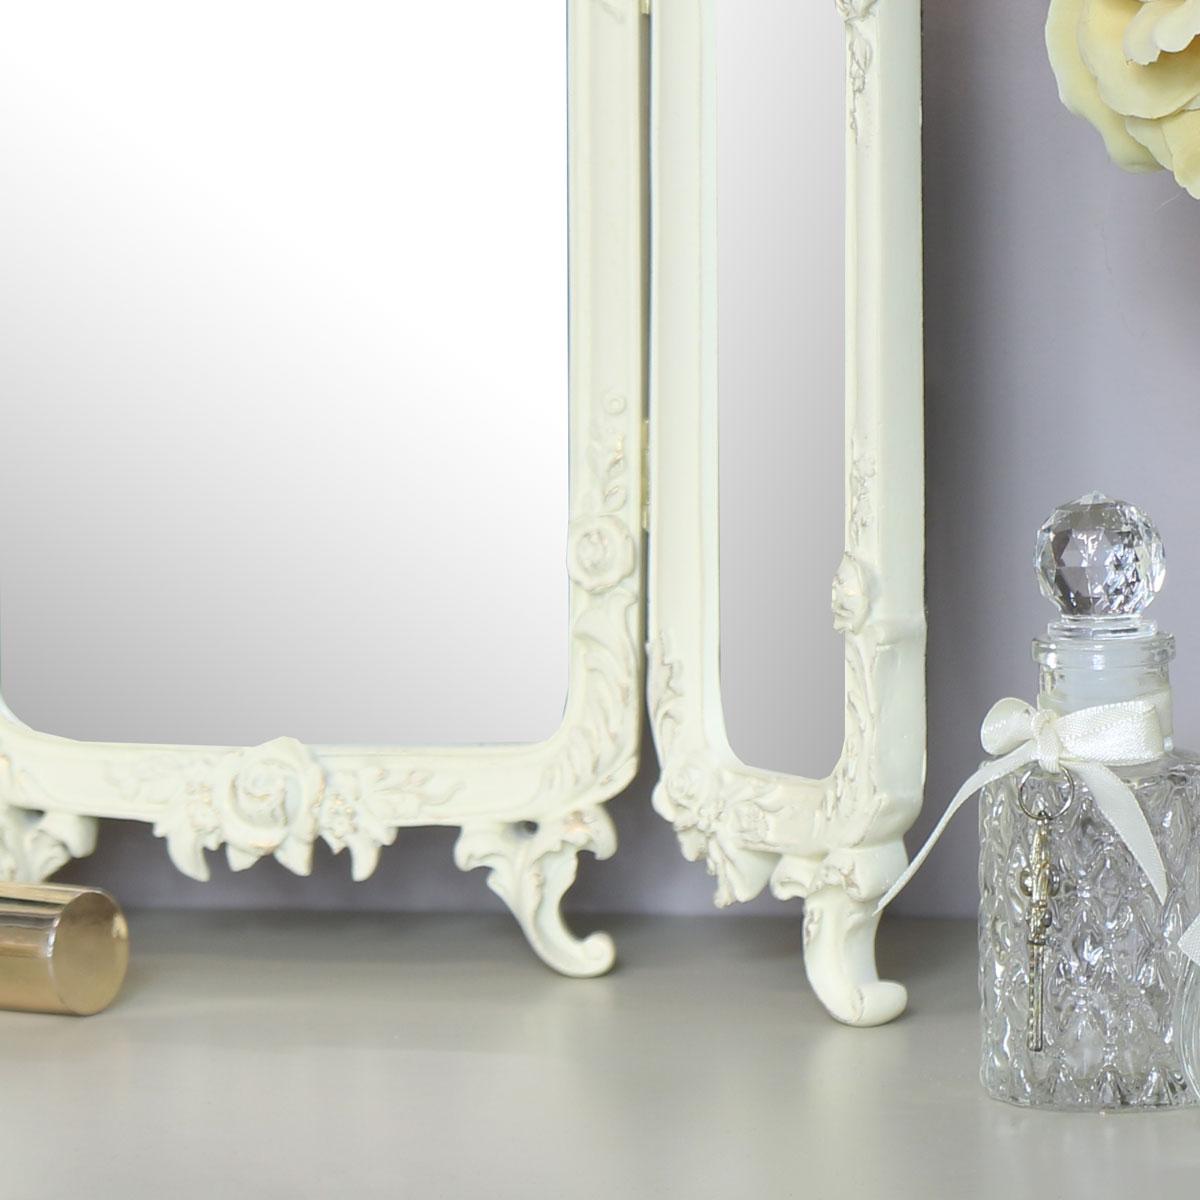 Small Ornate Rose Triple Mirror  - 38cm x 38cm